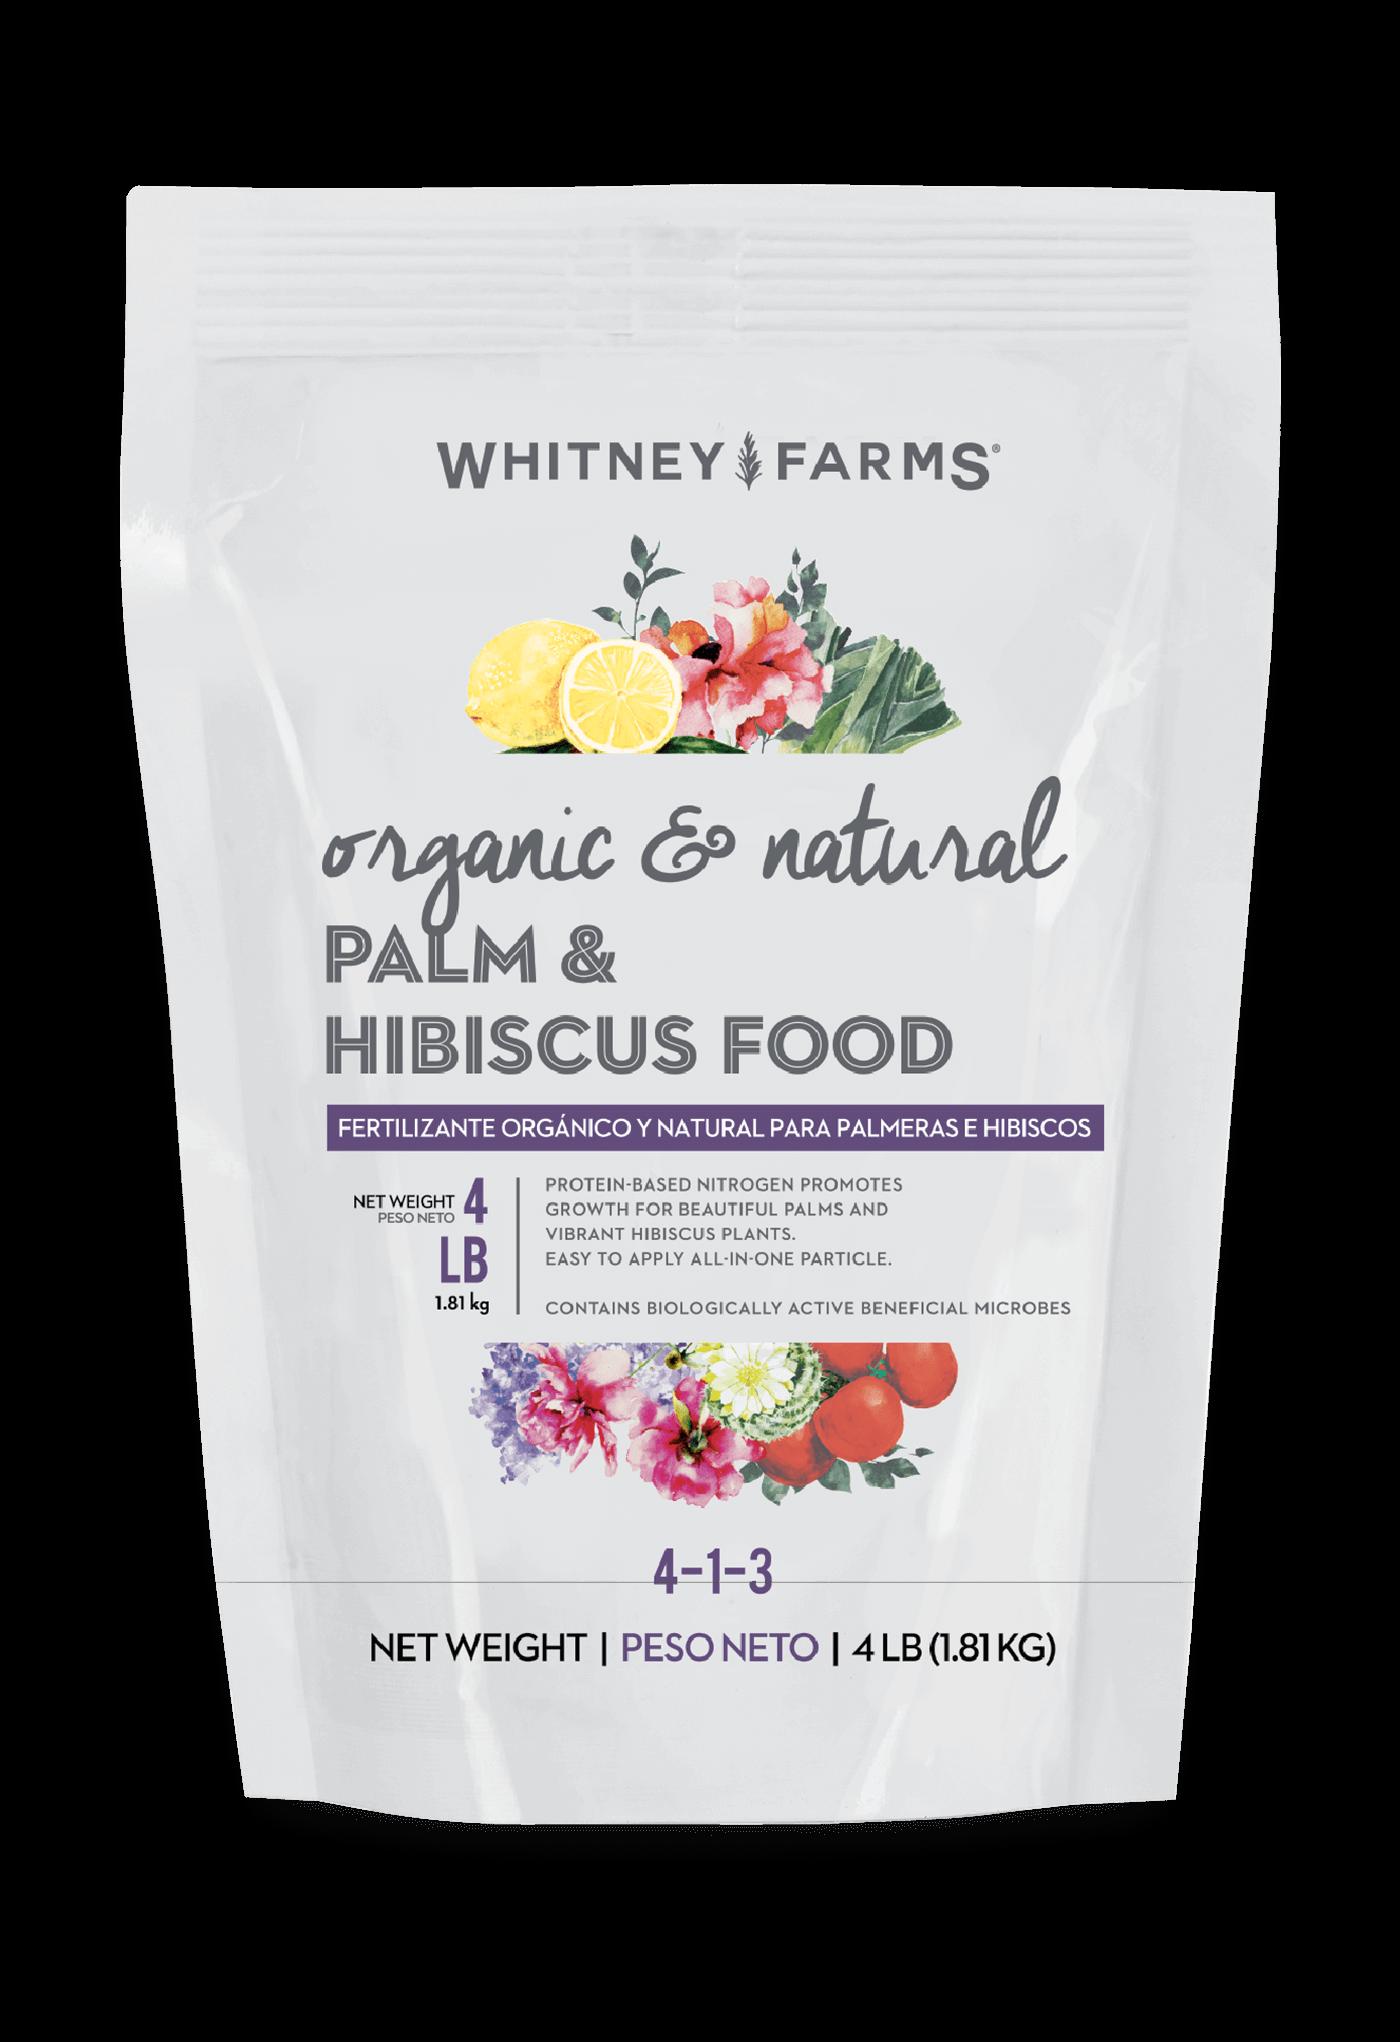 Palm & Hibiscus Food